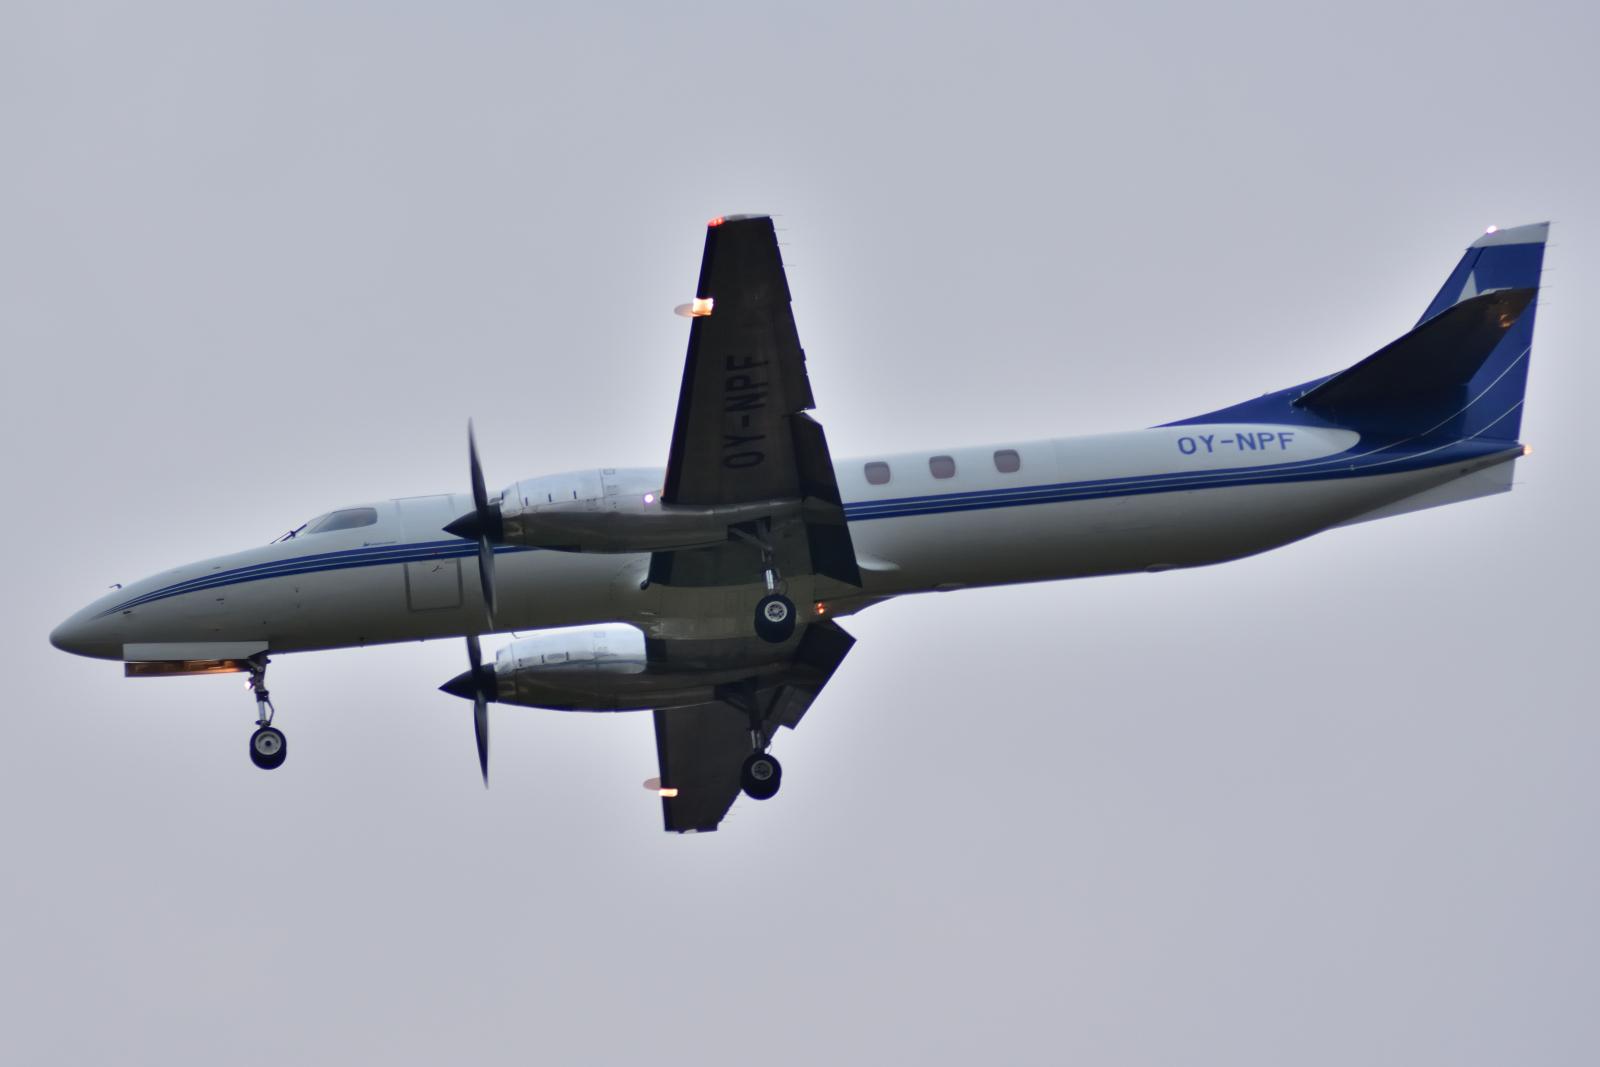 Fairchild, OY-NPF